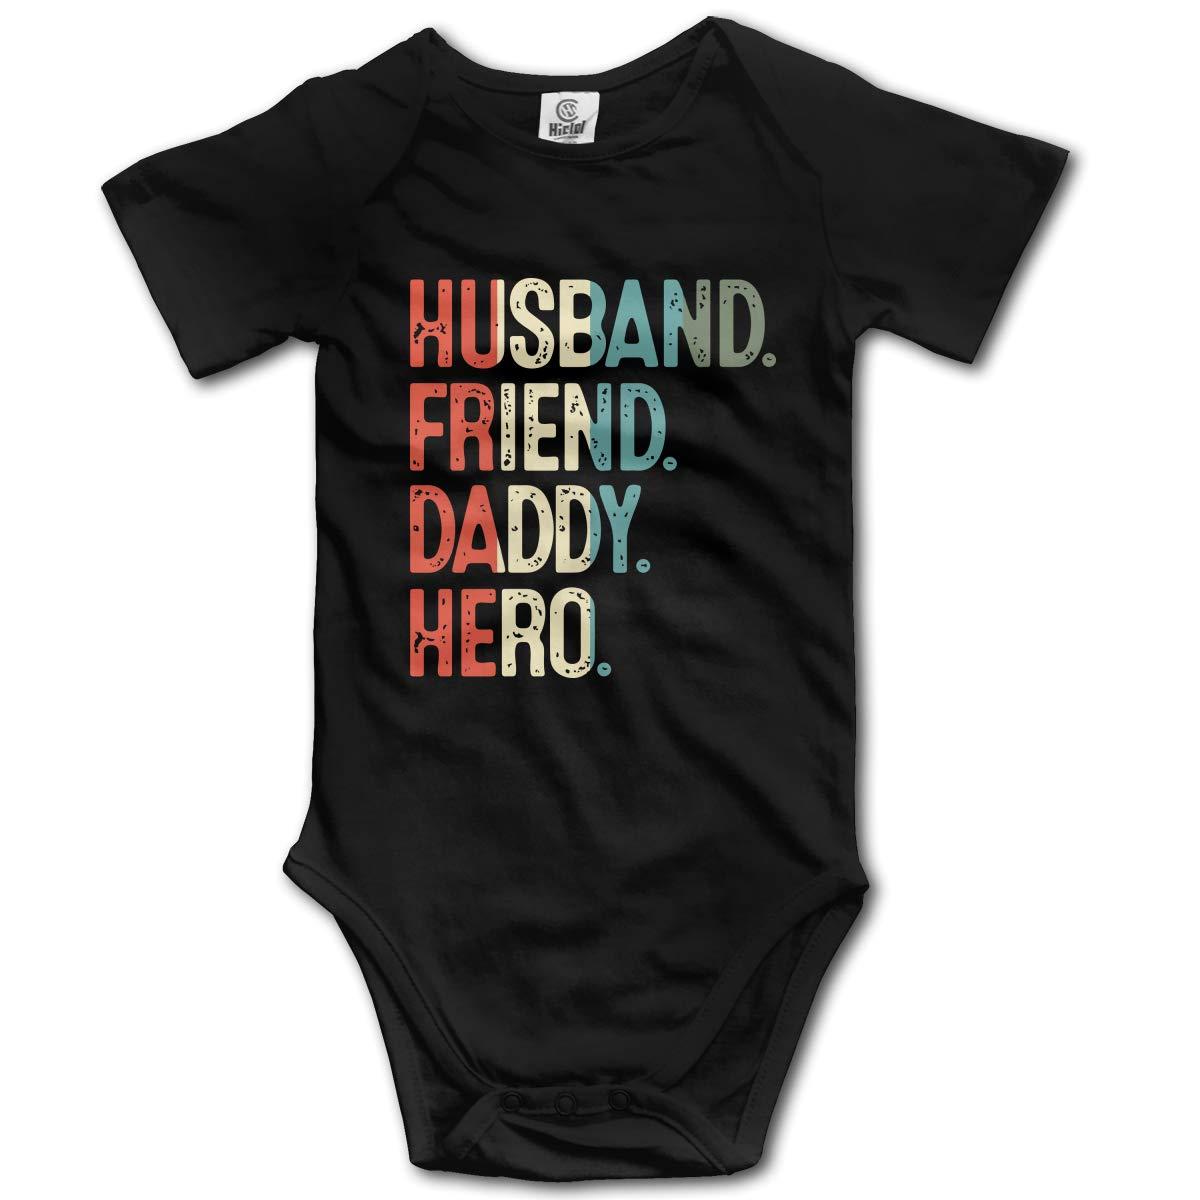 Vintage Husband Friend Daddy Newborn Infant Baby Short Sleeve Romper Jumpsuit 0-24 Months